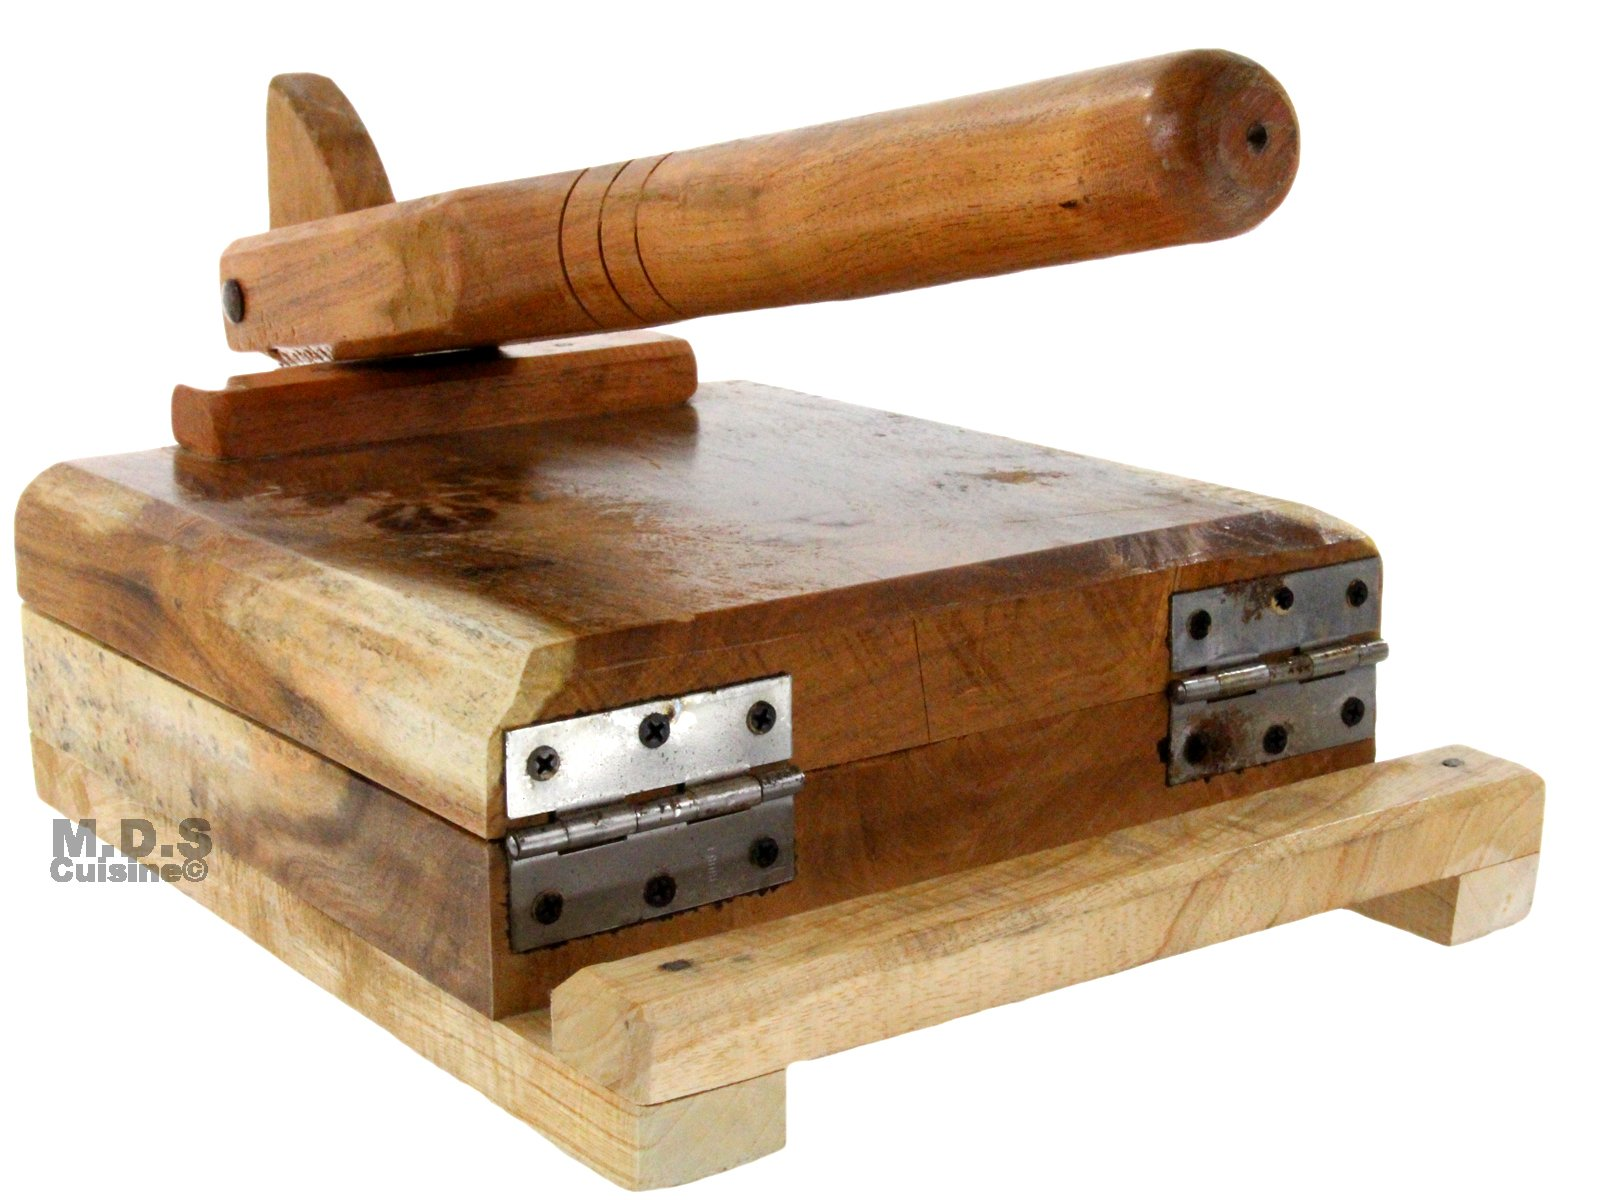 Tortilla Press Wood Tortilladora de Madera Barnizada Mezquite Tortilla Press Heavy Duty 9.5''x 9'' by K&R Kitchen Restaurant Supplies (Image #4)